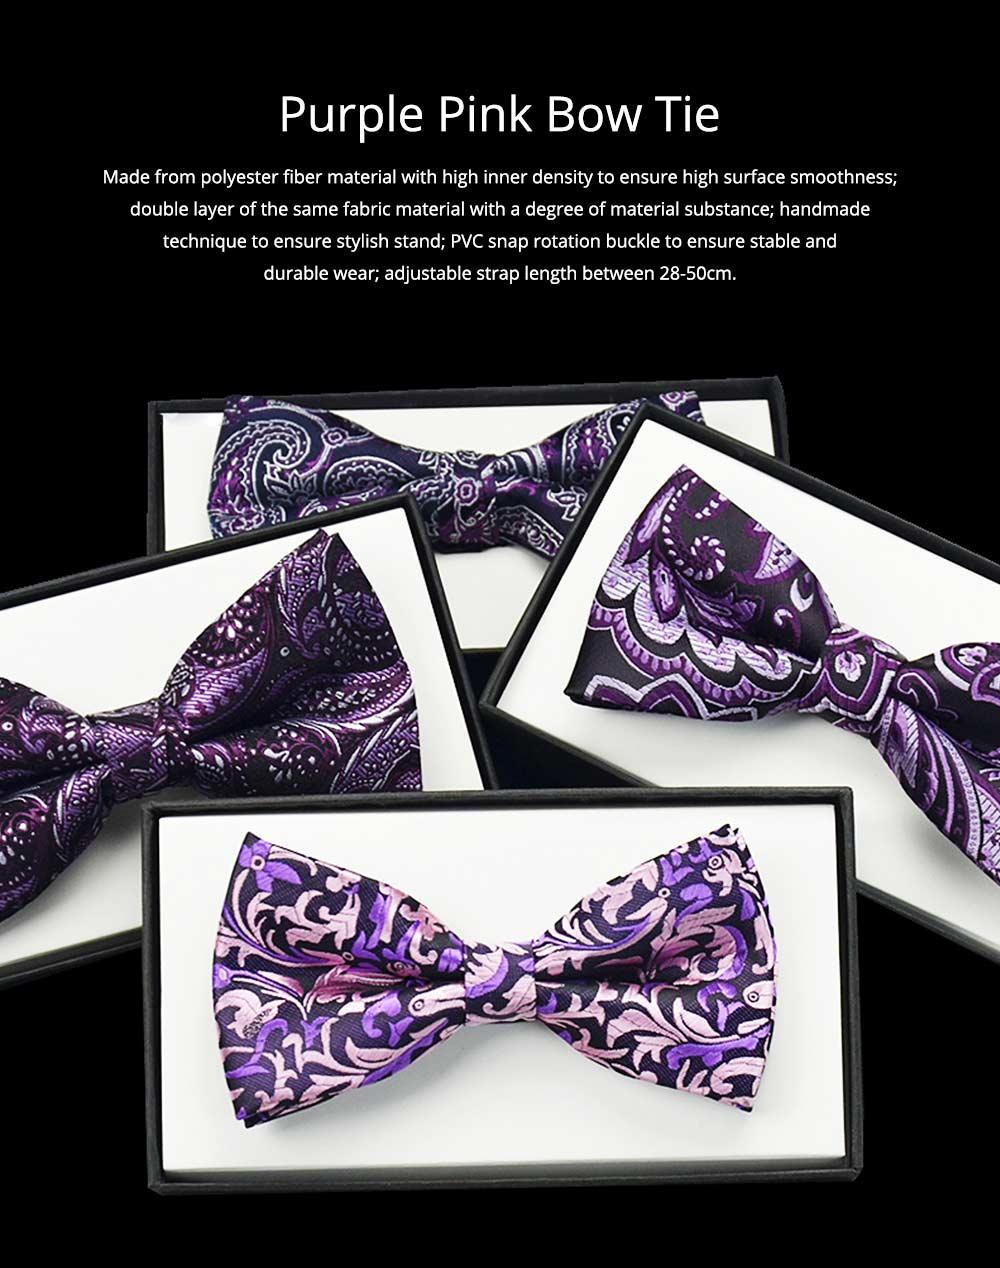 Bow Tie for Wedding Business Suit Fashionable British Style Elviro Tie Bridegroom Groomsman Used Bow Tie Purple Pink Tie European Pattern Design Tie 0